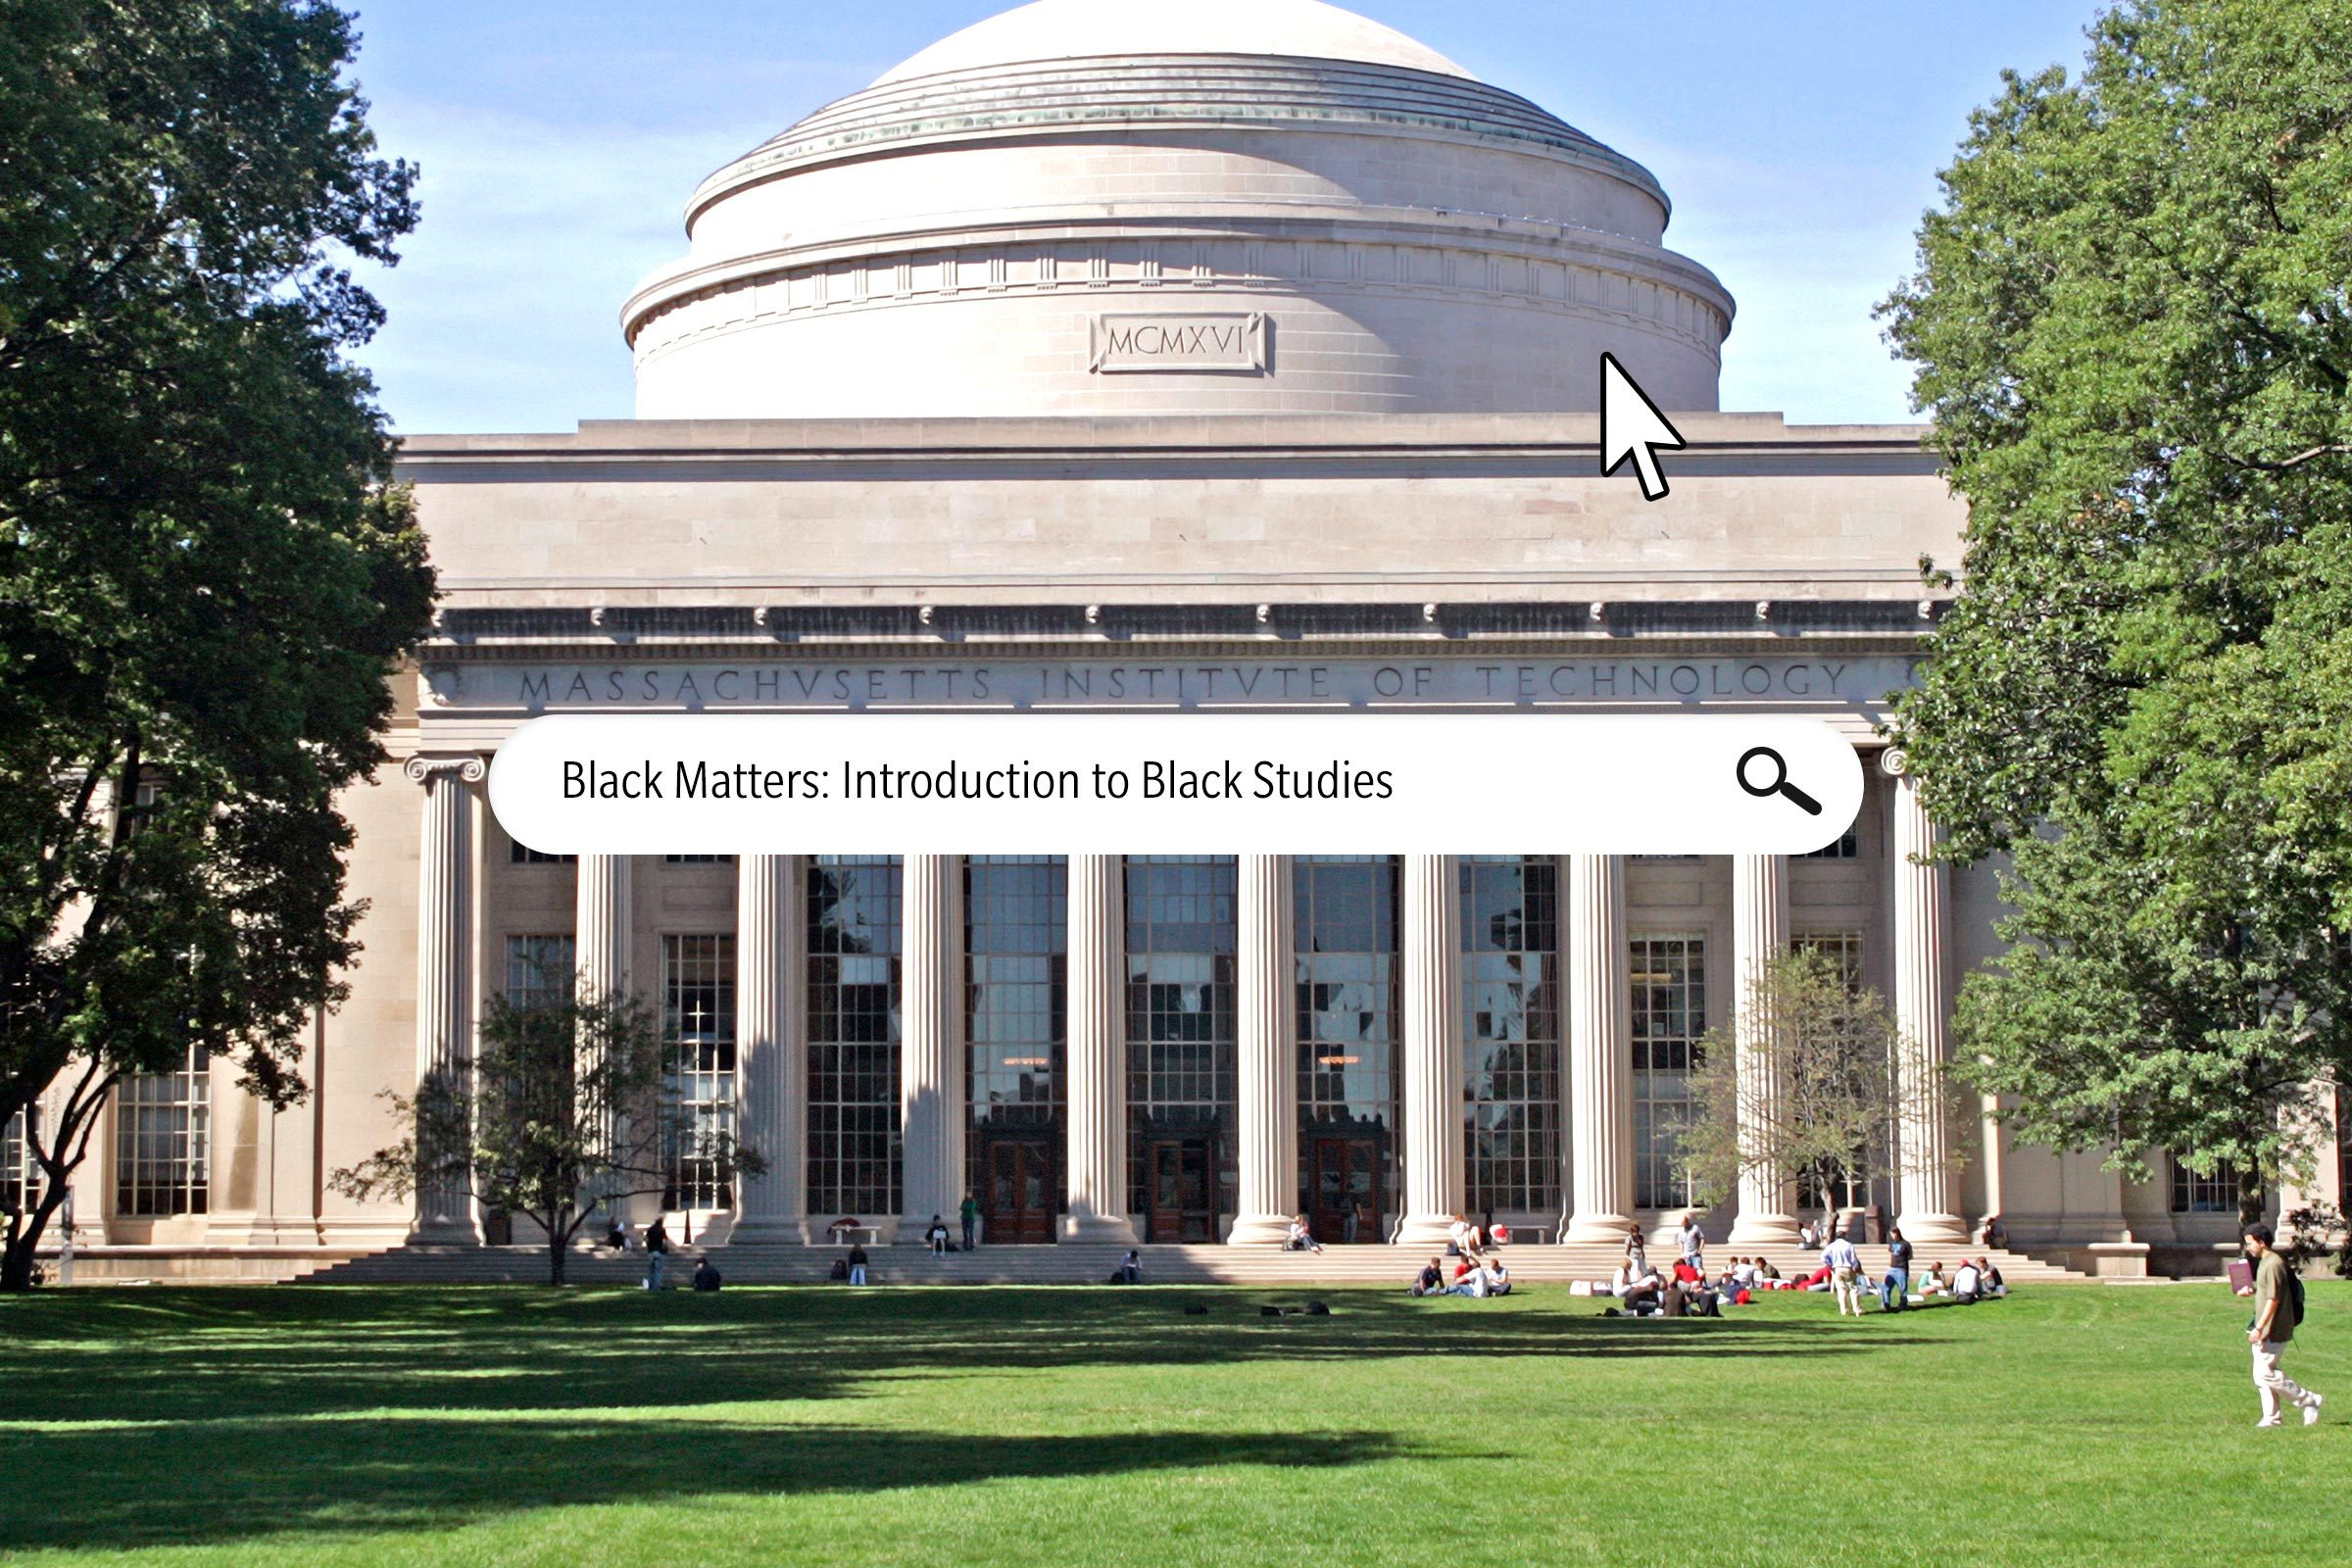 Black Matters: Introduction to Black Studies (MIT)